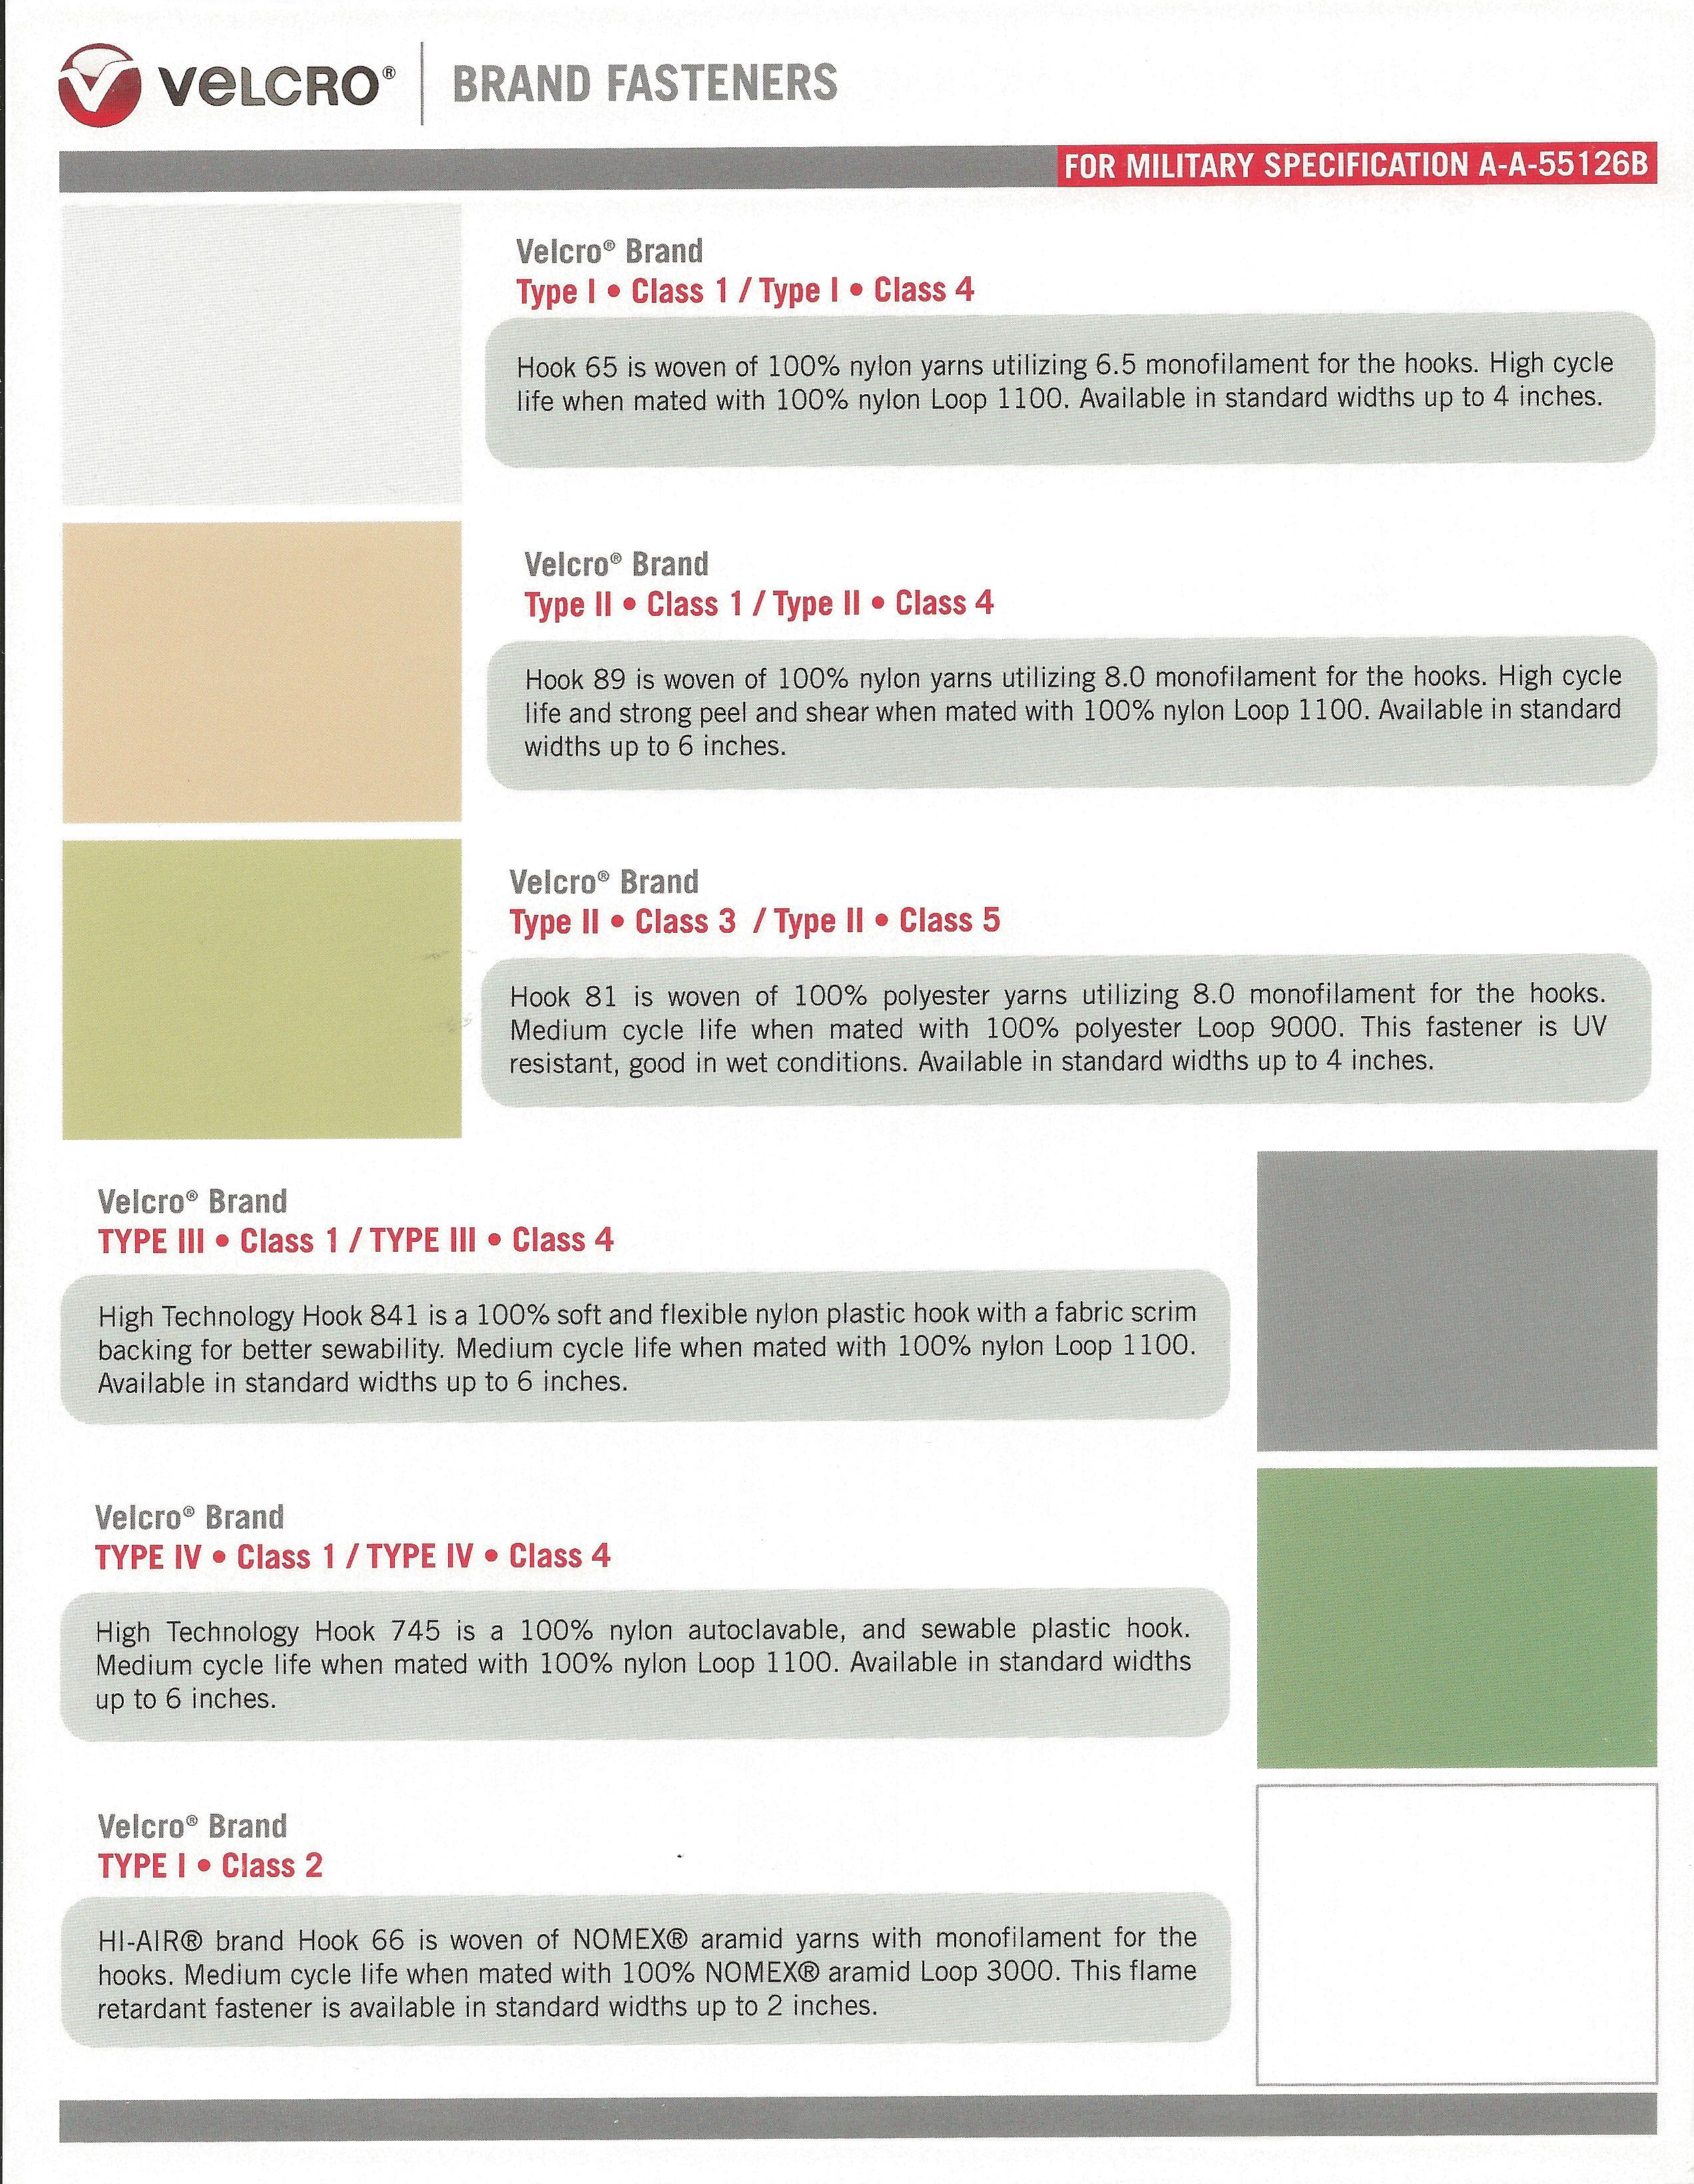 Velcro Military Product Specs